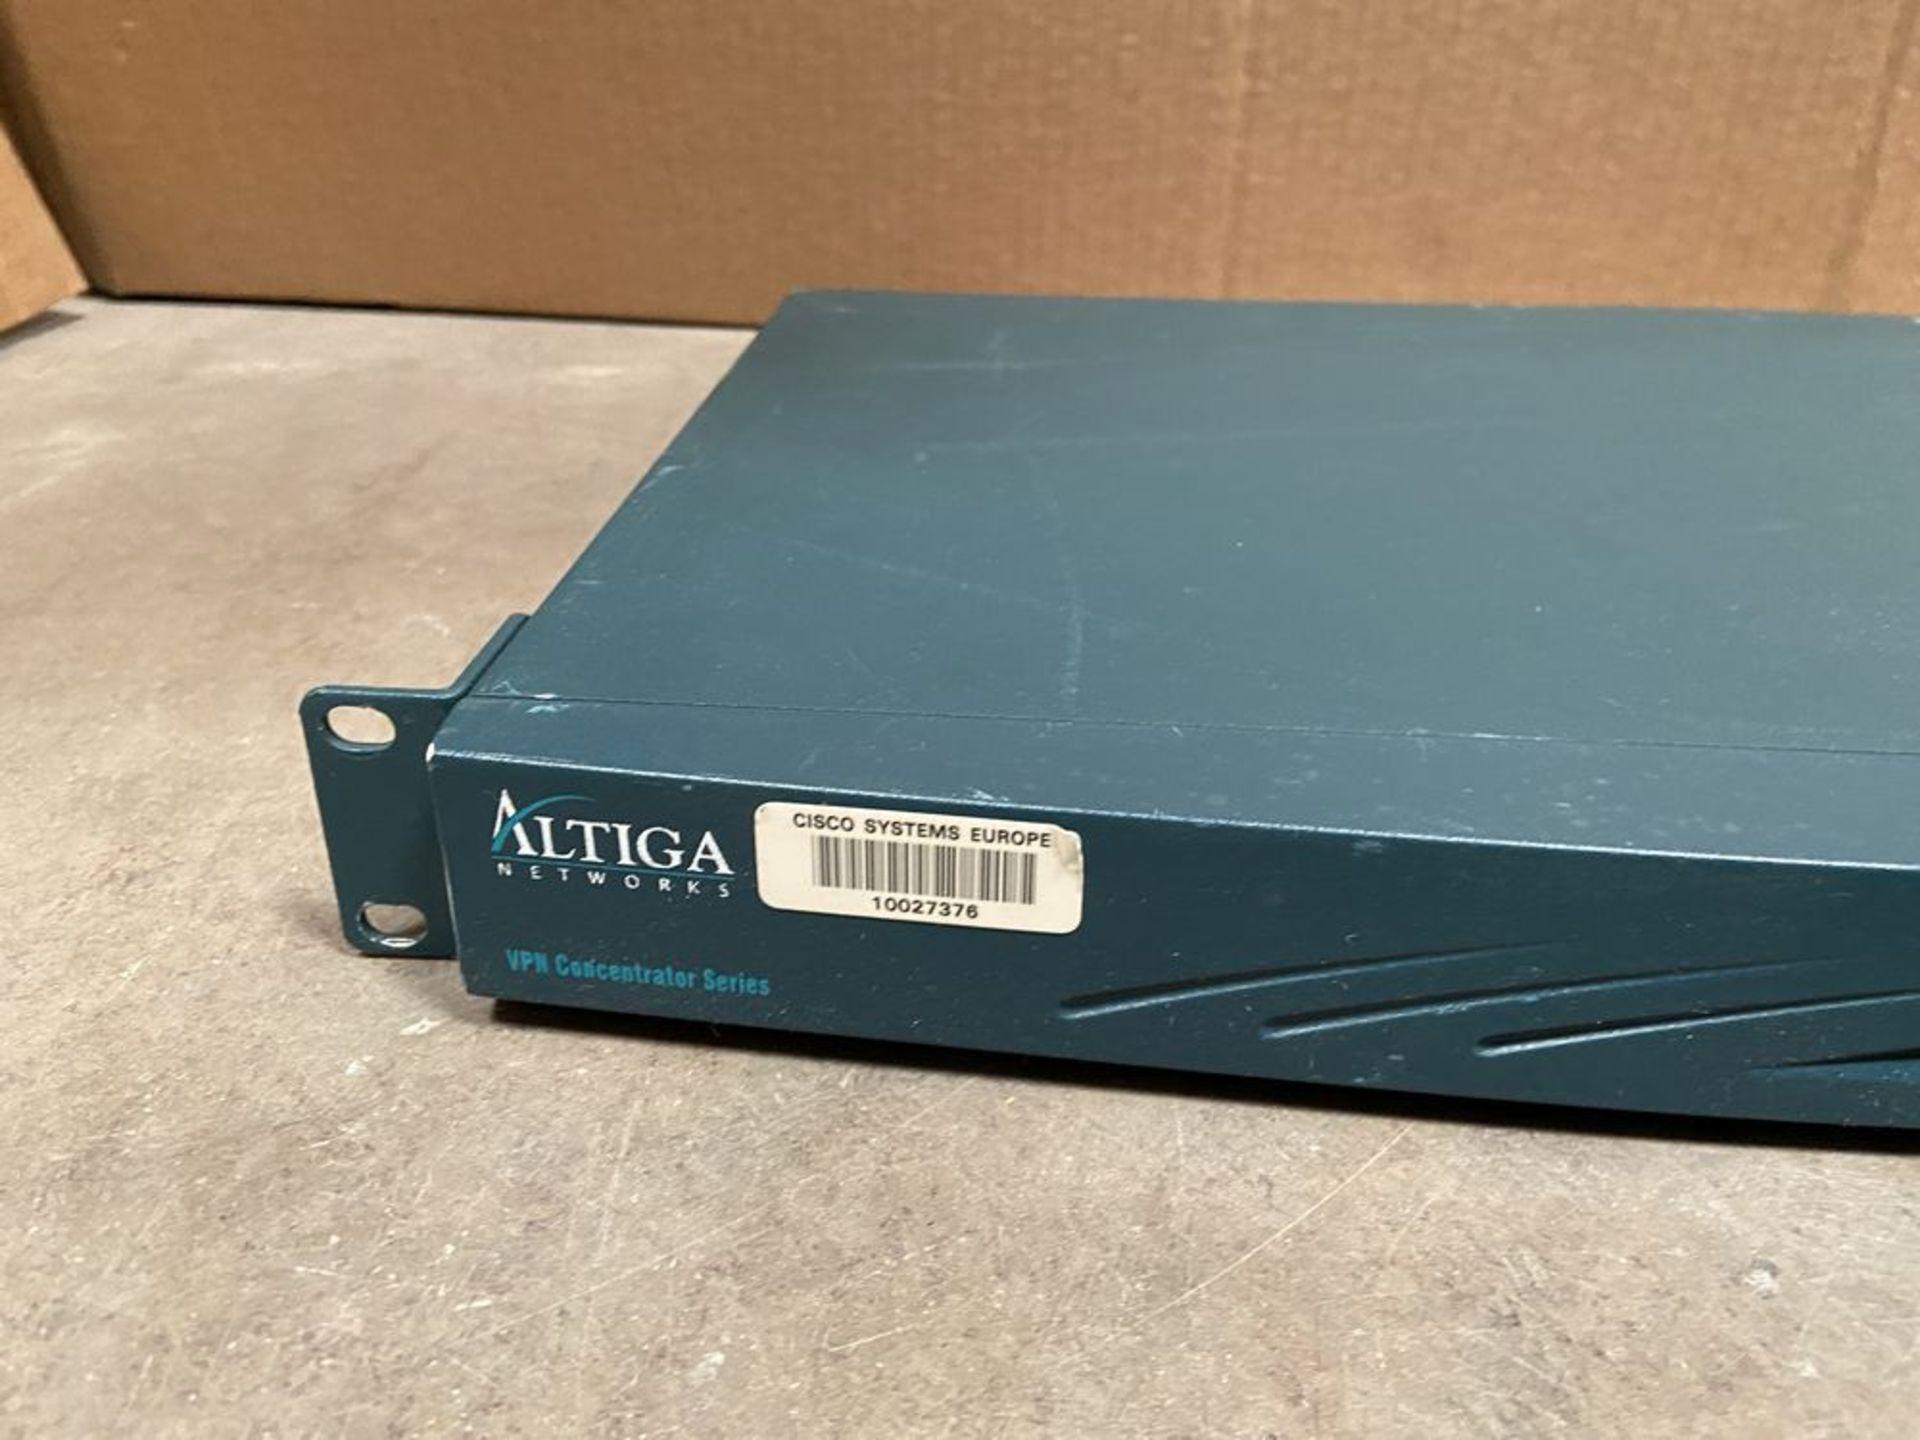 Altiga VPN Concentrator Series Model C5 - Image 3 of 8